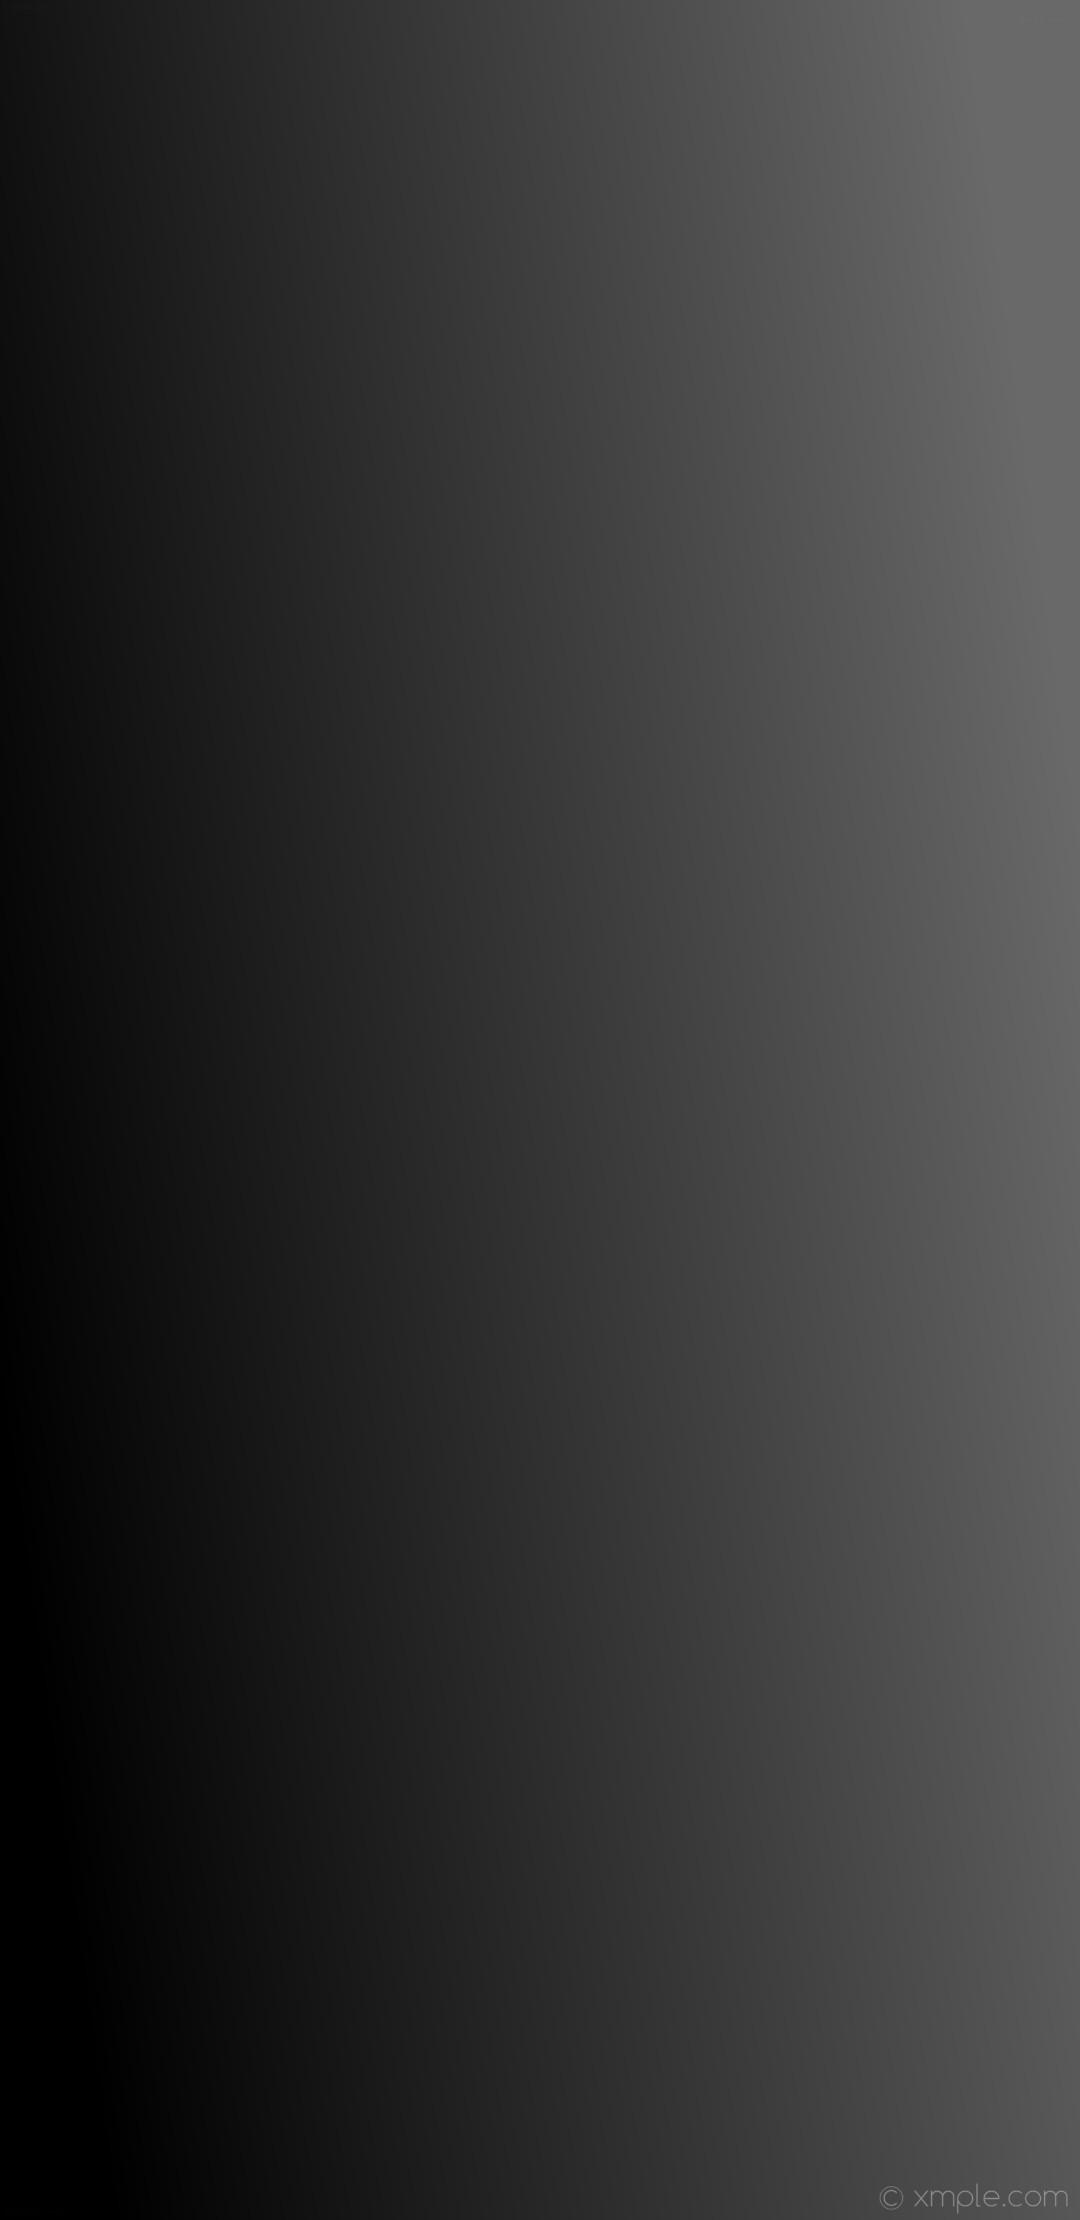 wallpaper gradient linear black grey dim gray #696969 #000000 30°